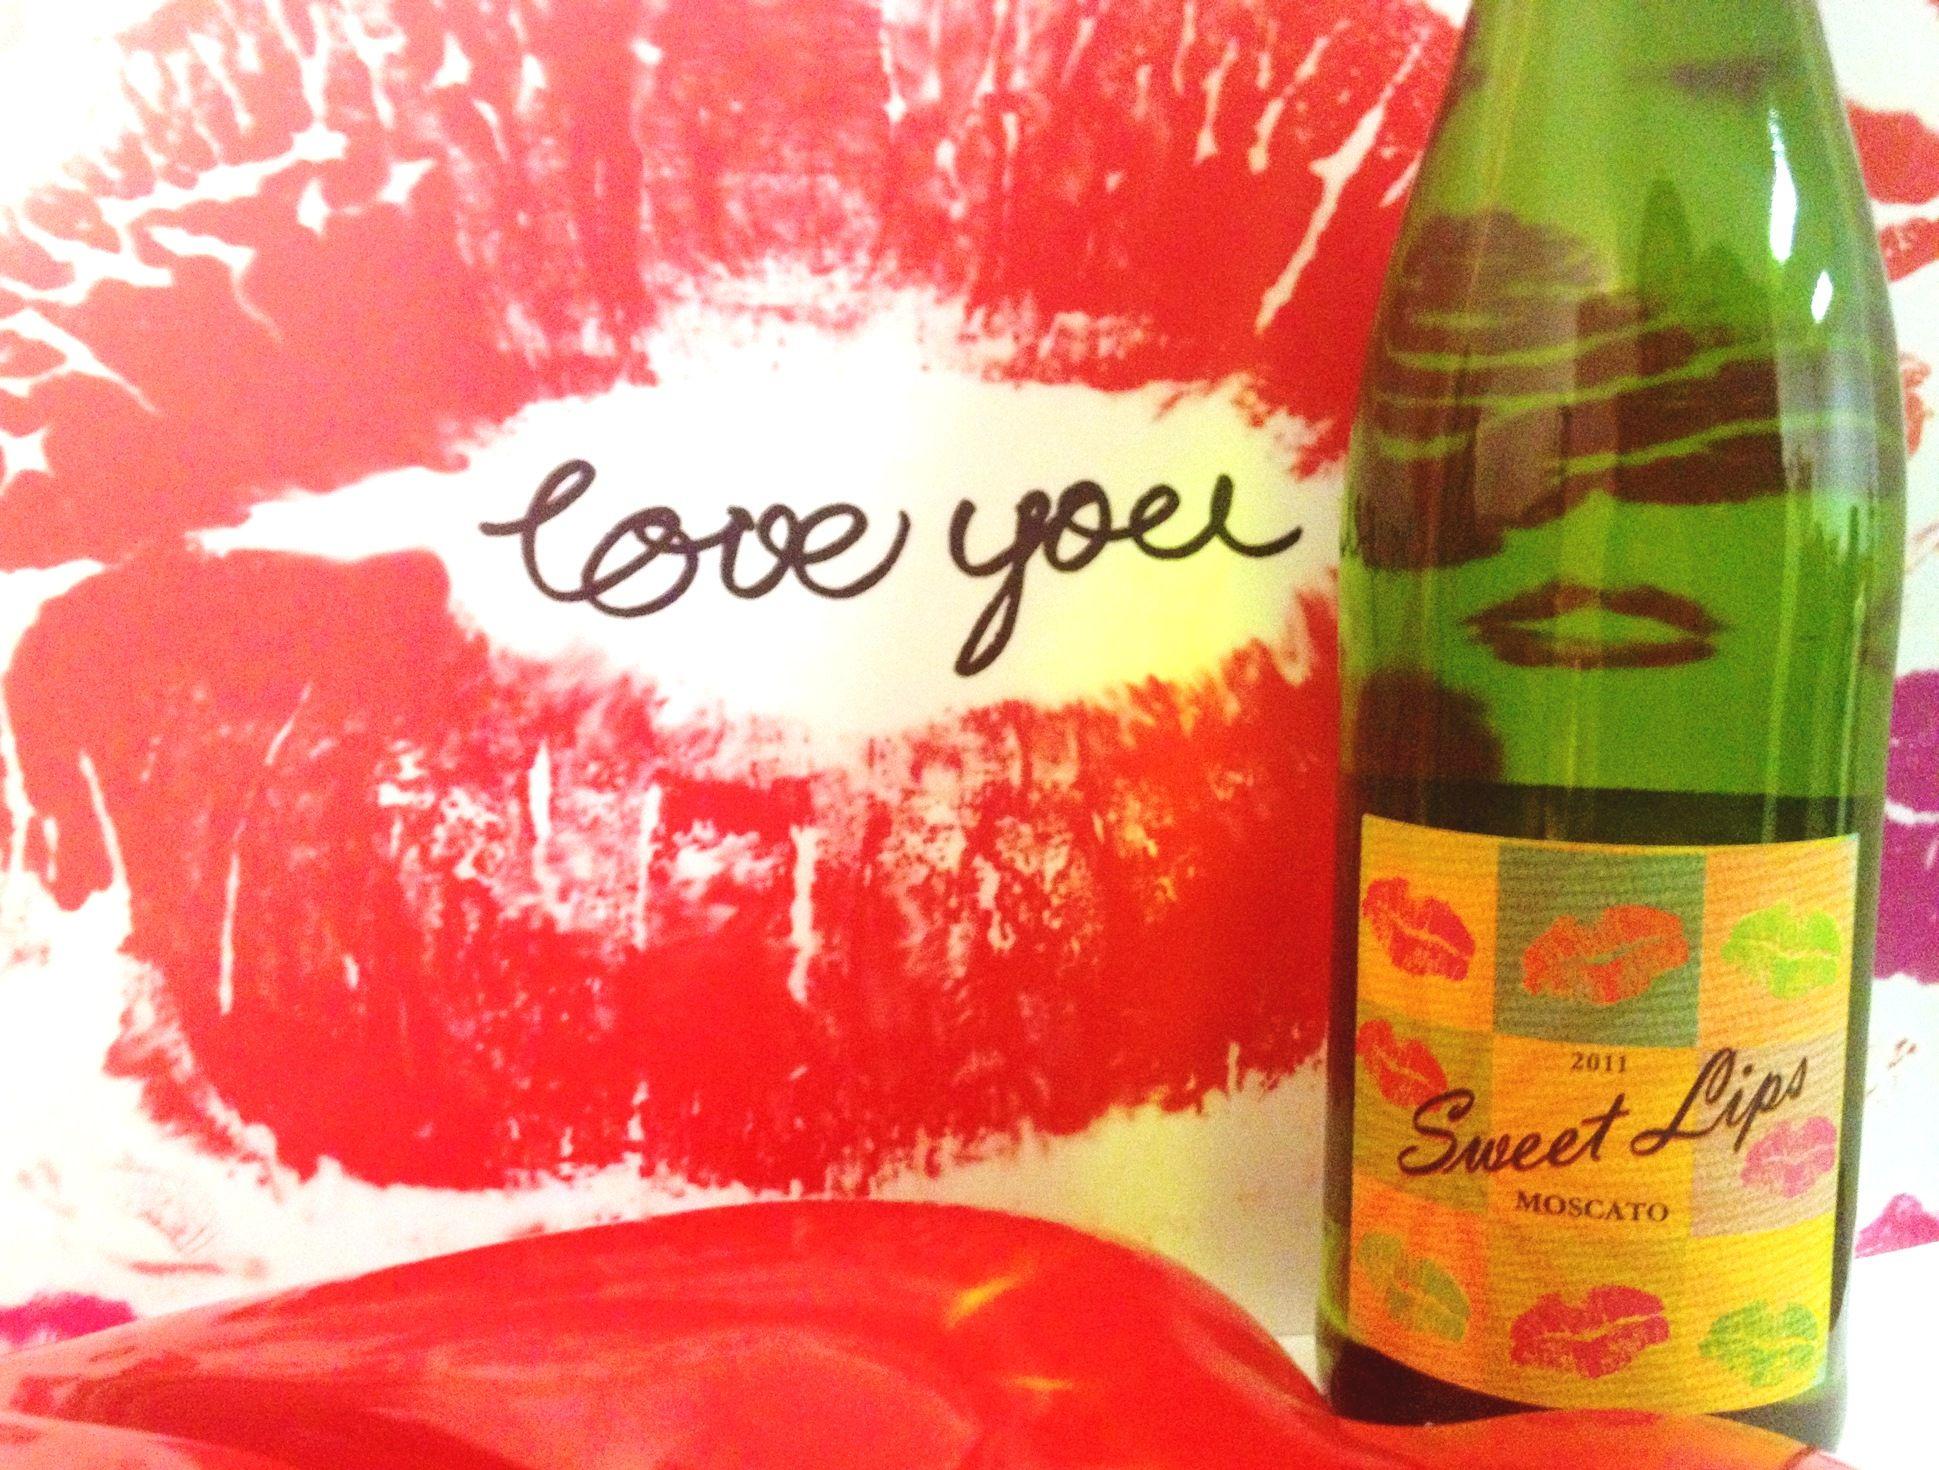 Sweet Lips Moscato Sweet Lips Alcoholic Drinks Wines